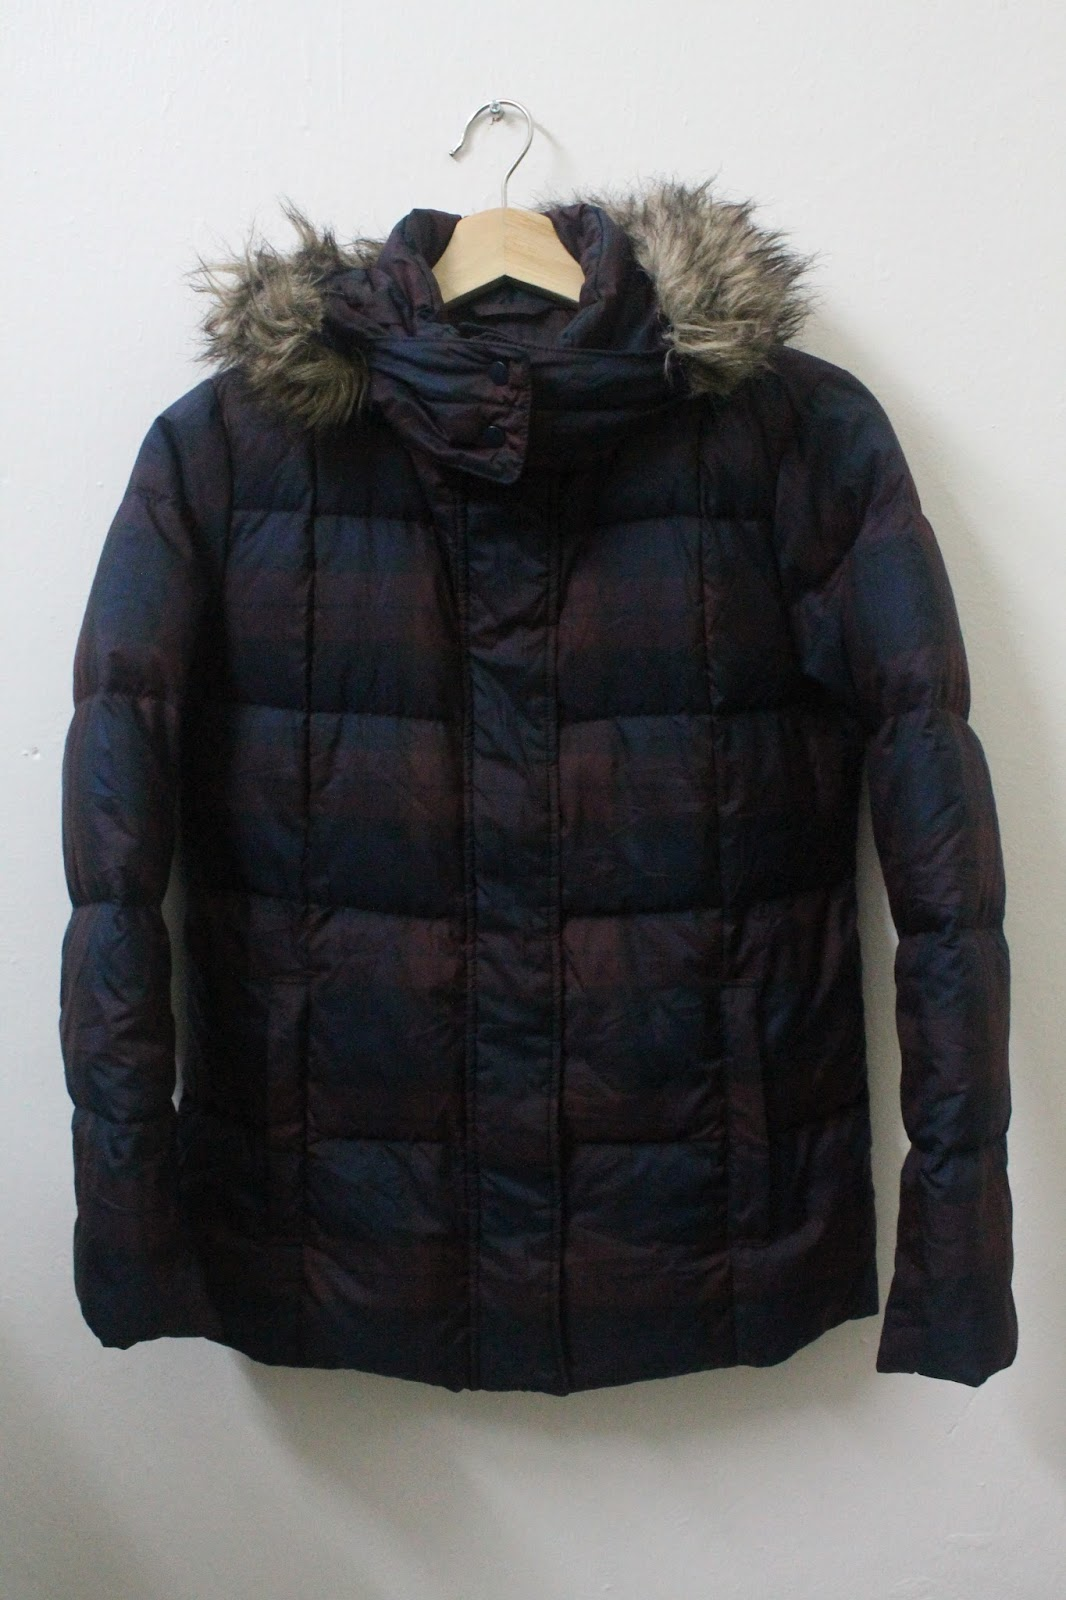 bundlebarangbaek original uniqlo winter hoodie jacket. Black Bedroom Furniture Sets. Home Design Ideas